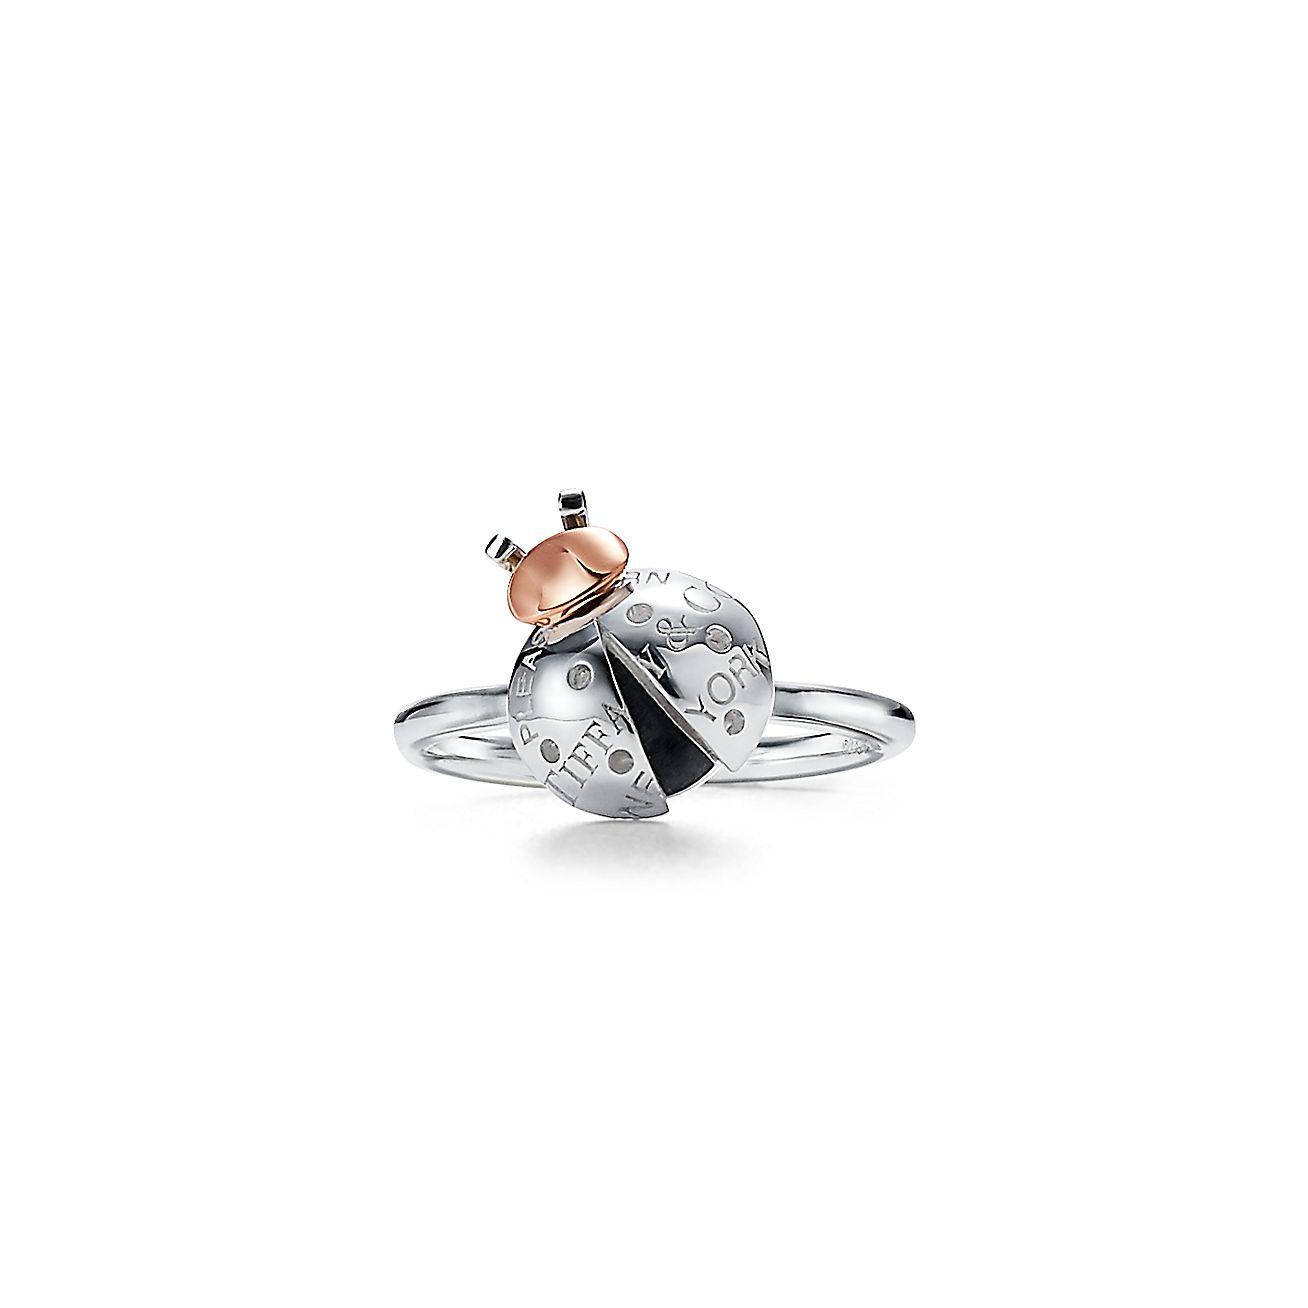 Tiffany Love Bugs Ladybug Ring